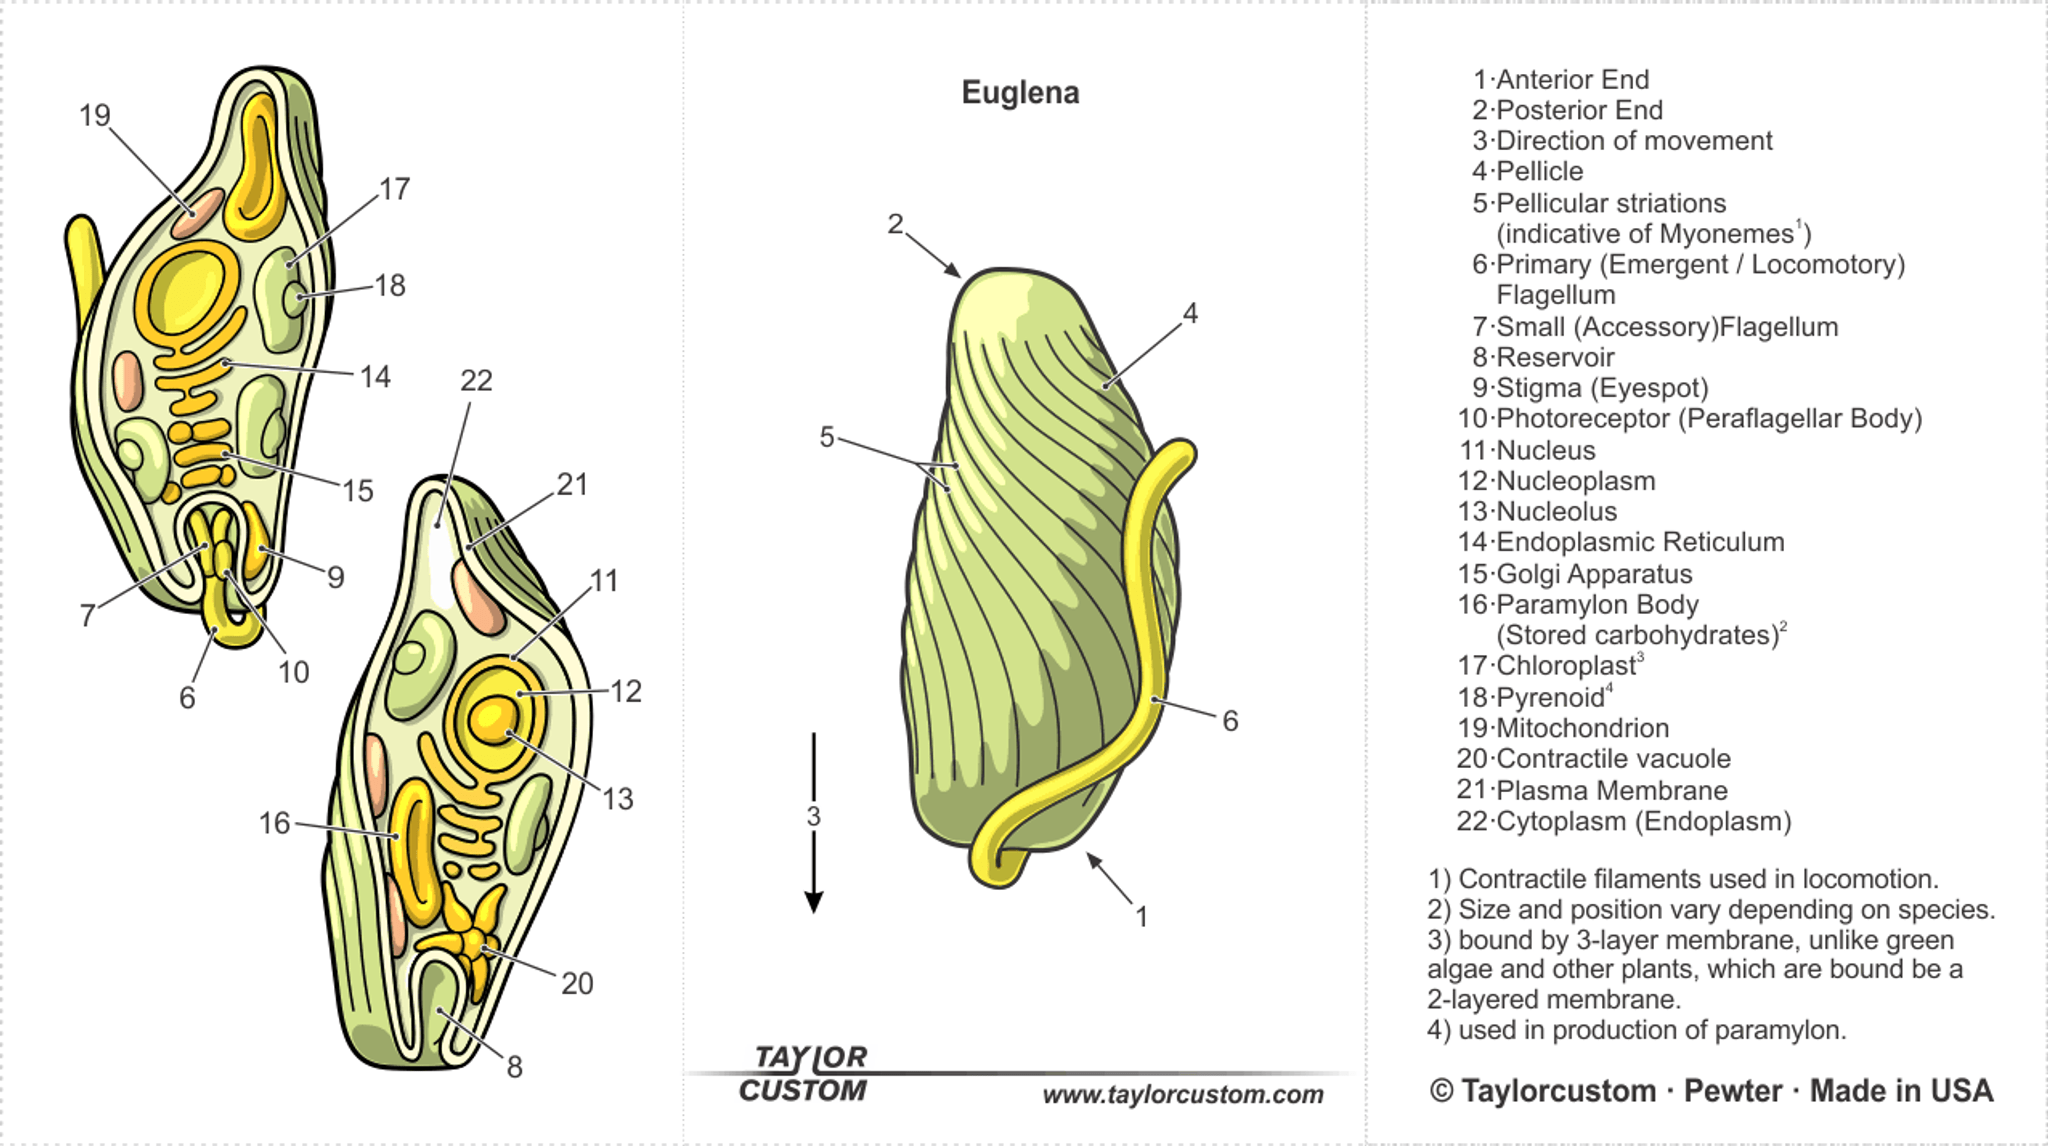 Euglena Necklace - Taylorcustom